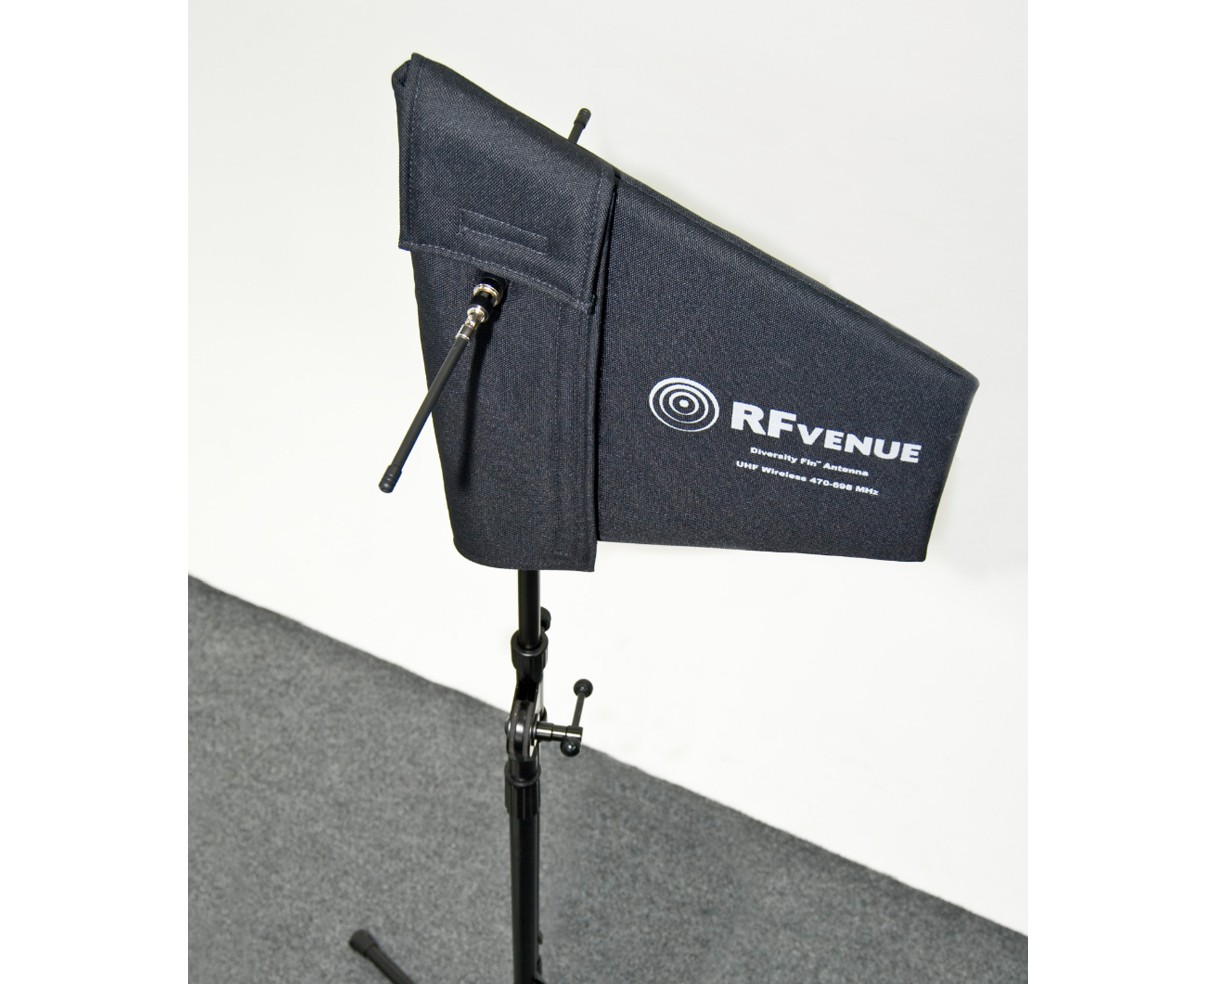 RFVenue Diversity Fin Antenna